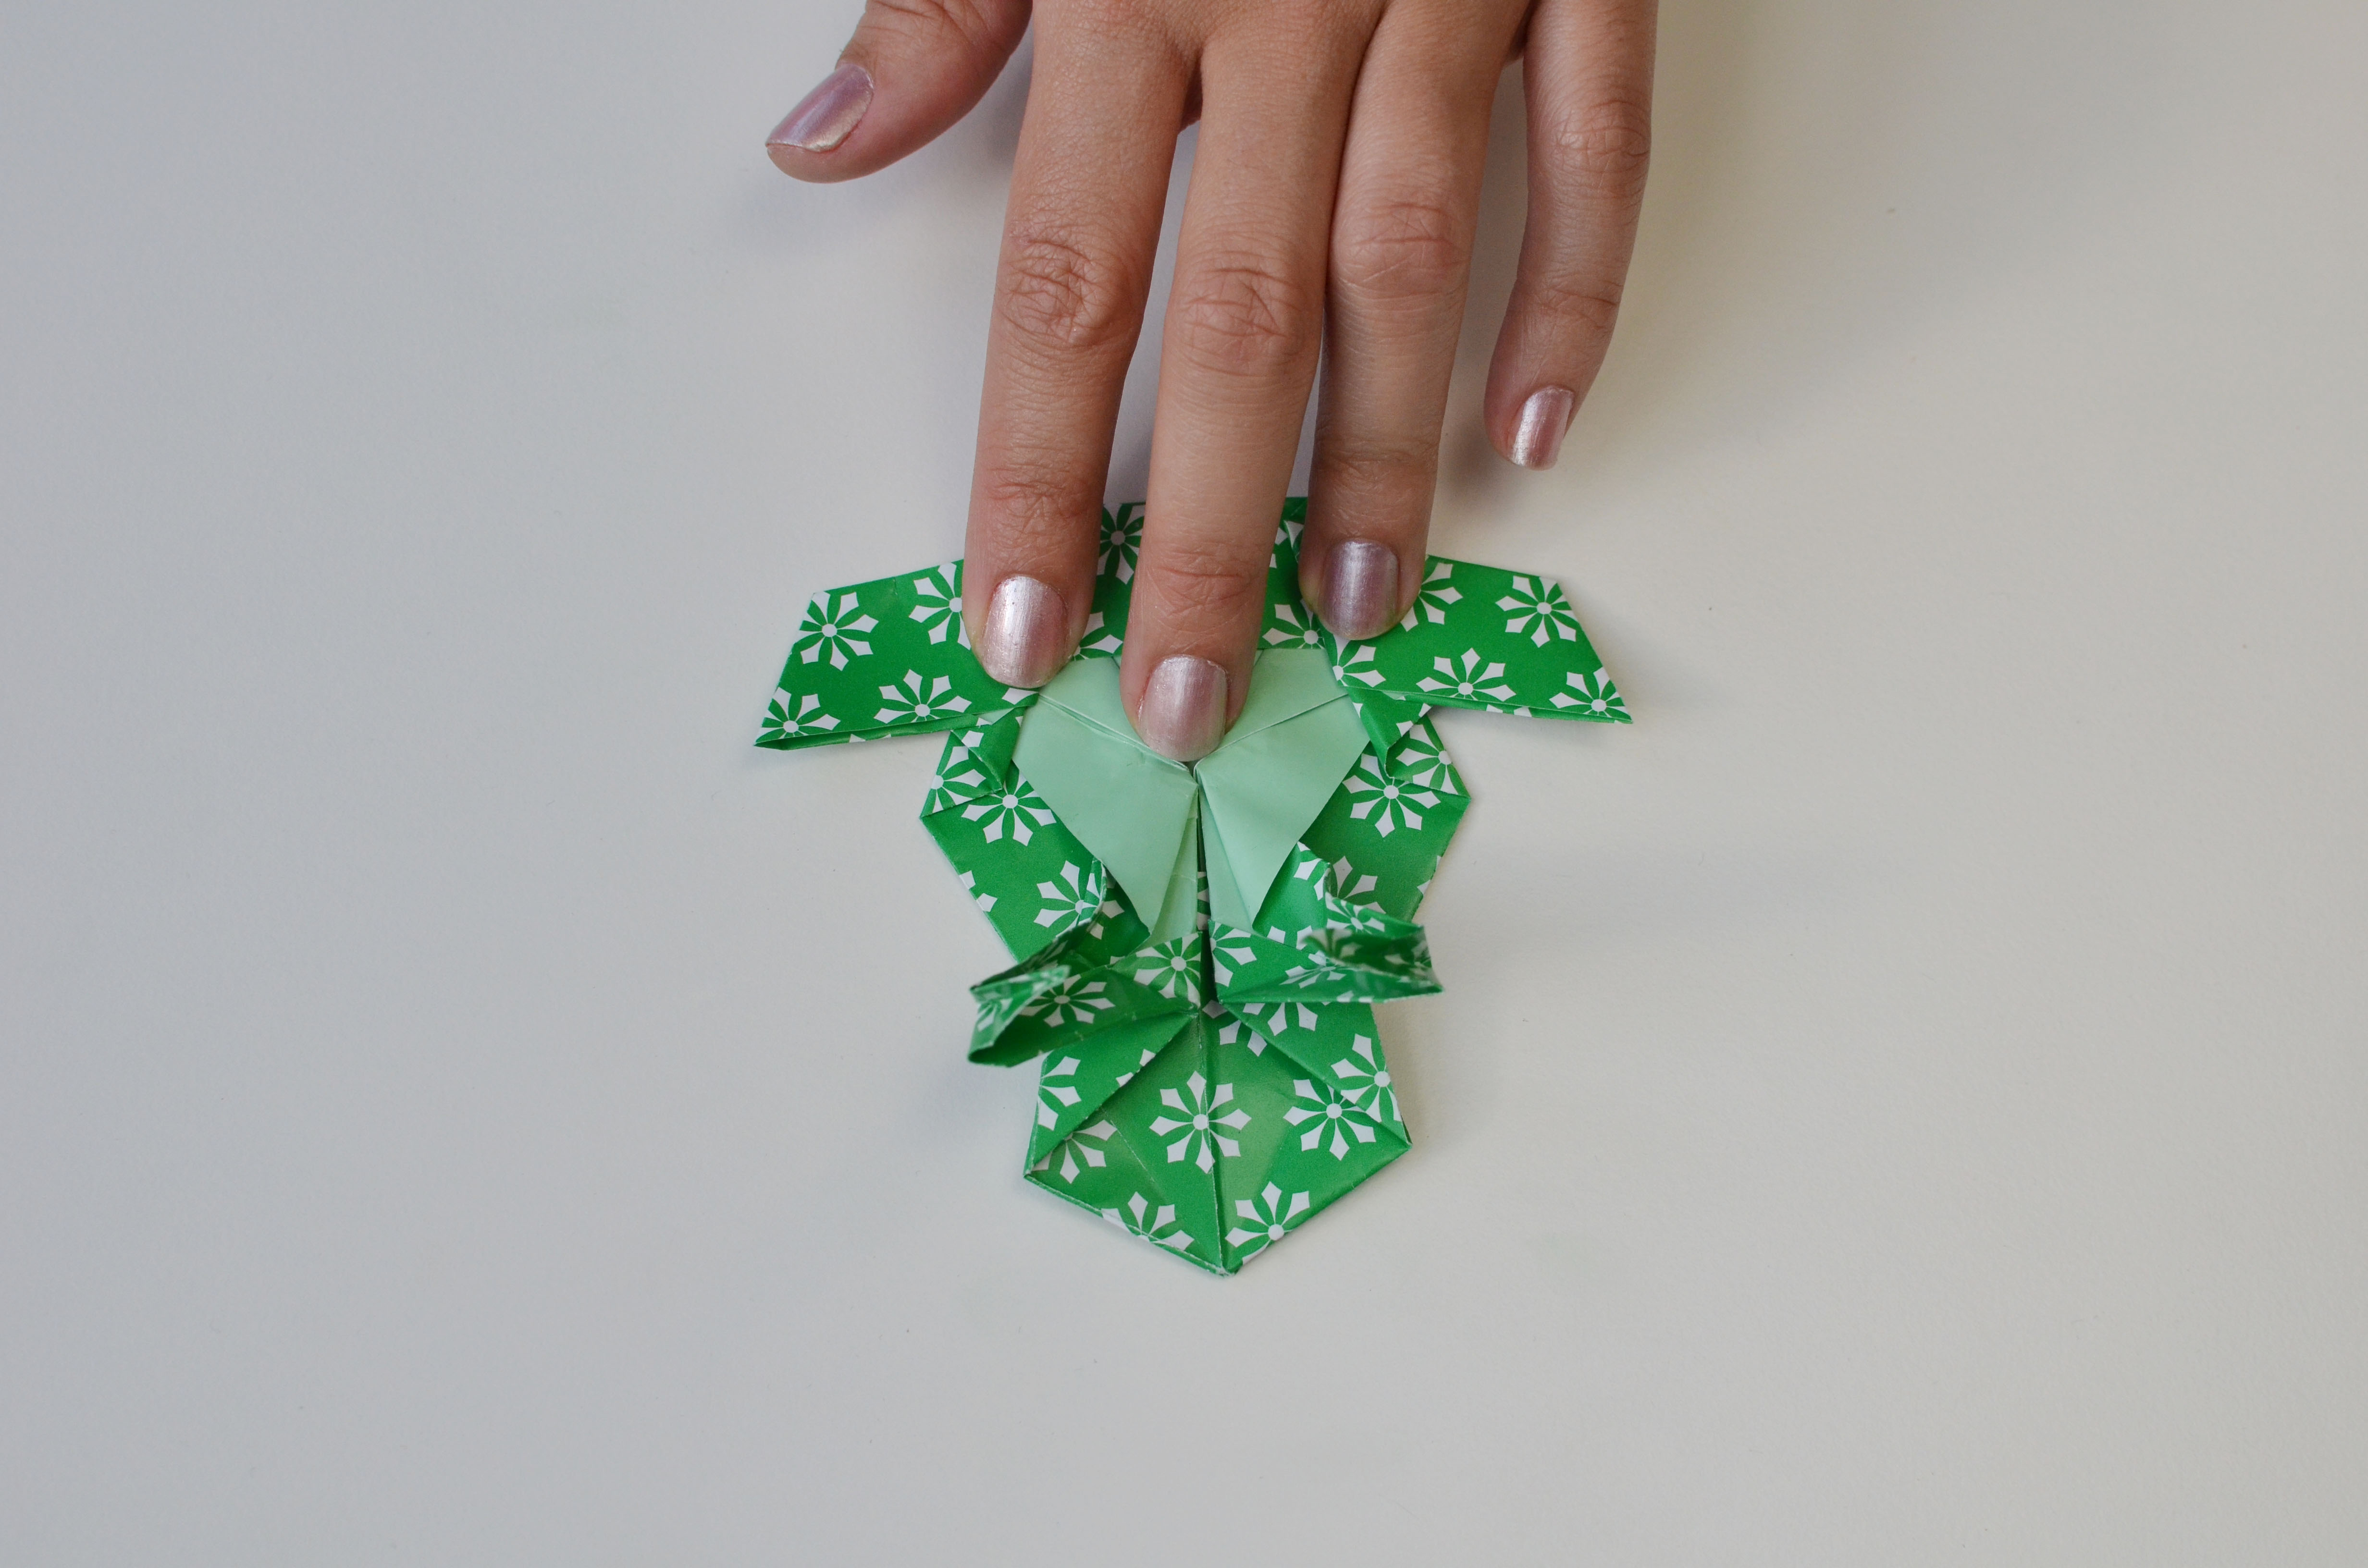 braincrafts_frog_origami_pt54.jpg